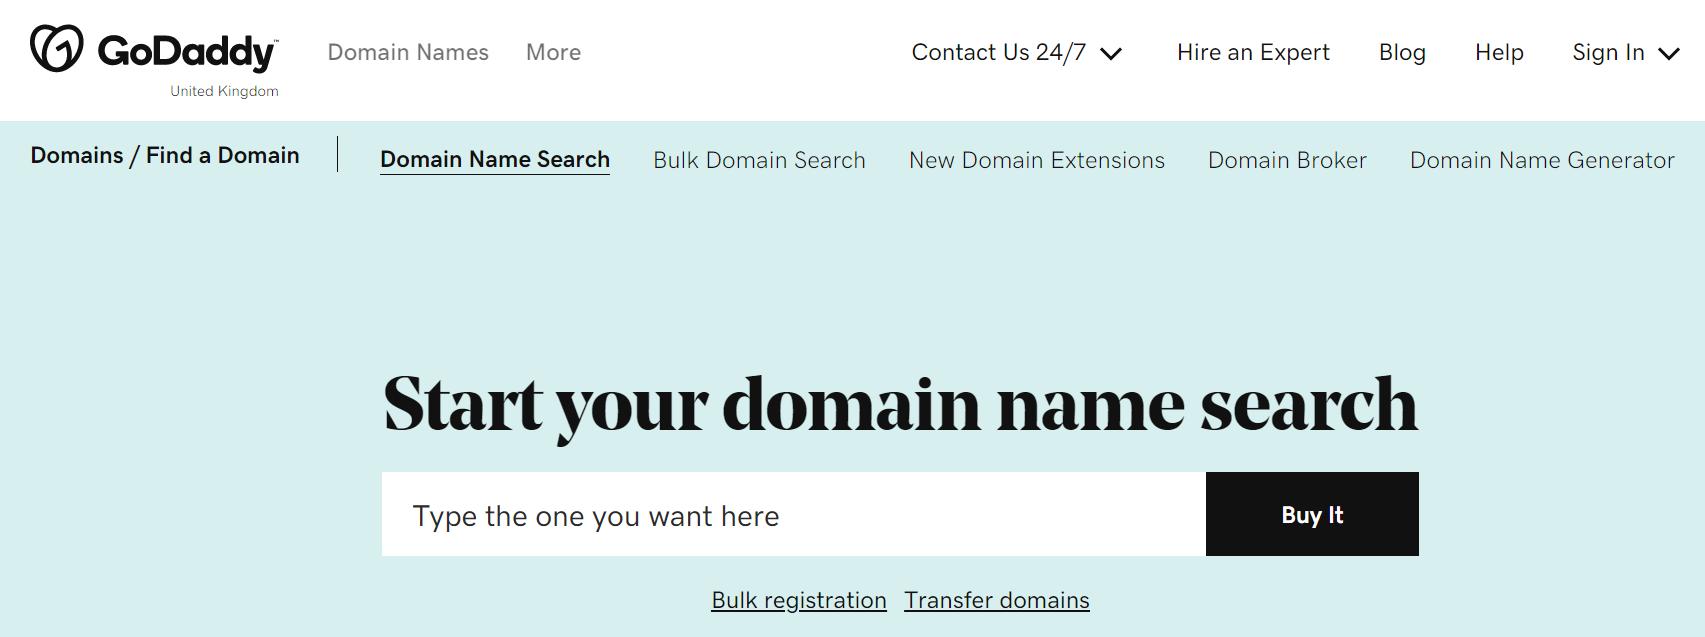 GoDaddy domain search